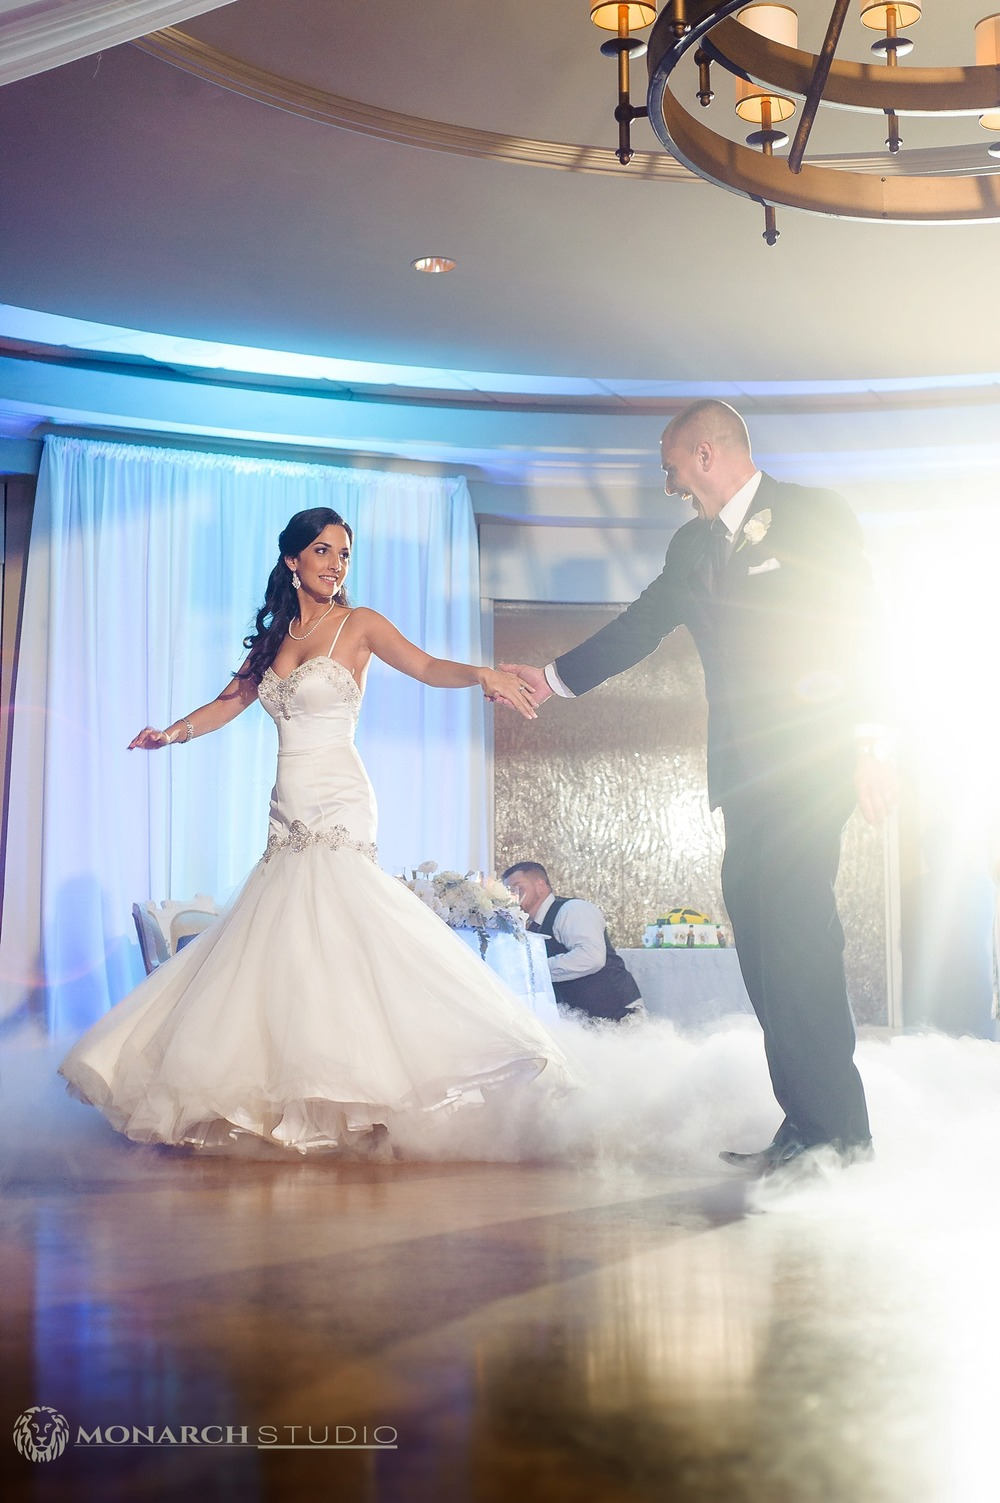 Palm-Coast-Wedding-Photographer-Monarch-Studio_0095.jpg